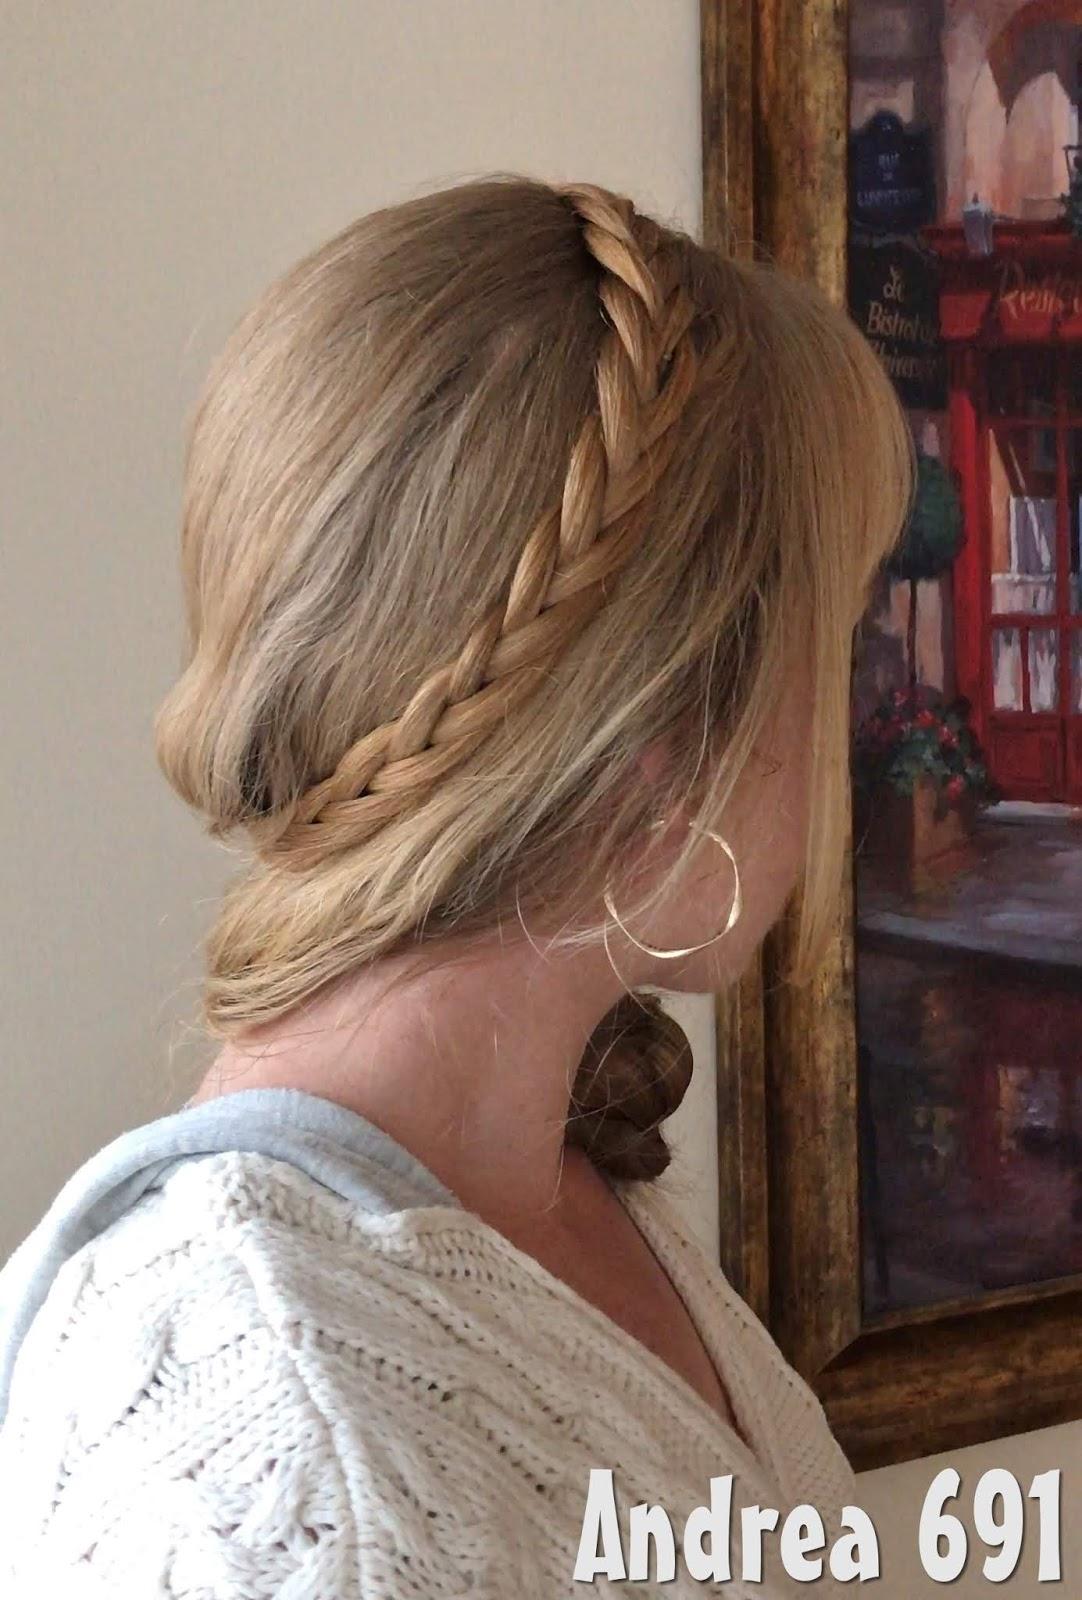 Groovy Braids Hairstyles For Super Long Hair Simple Braided Hairstyle Schematic Wiring Diagrams Phreekkolirunnerswayorg